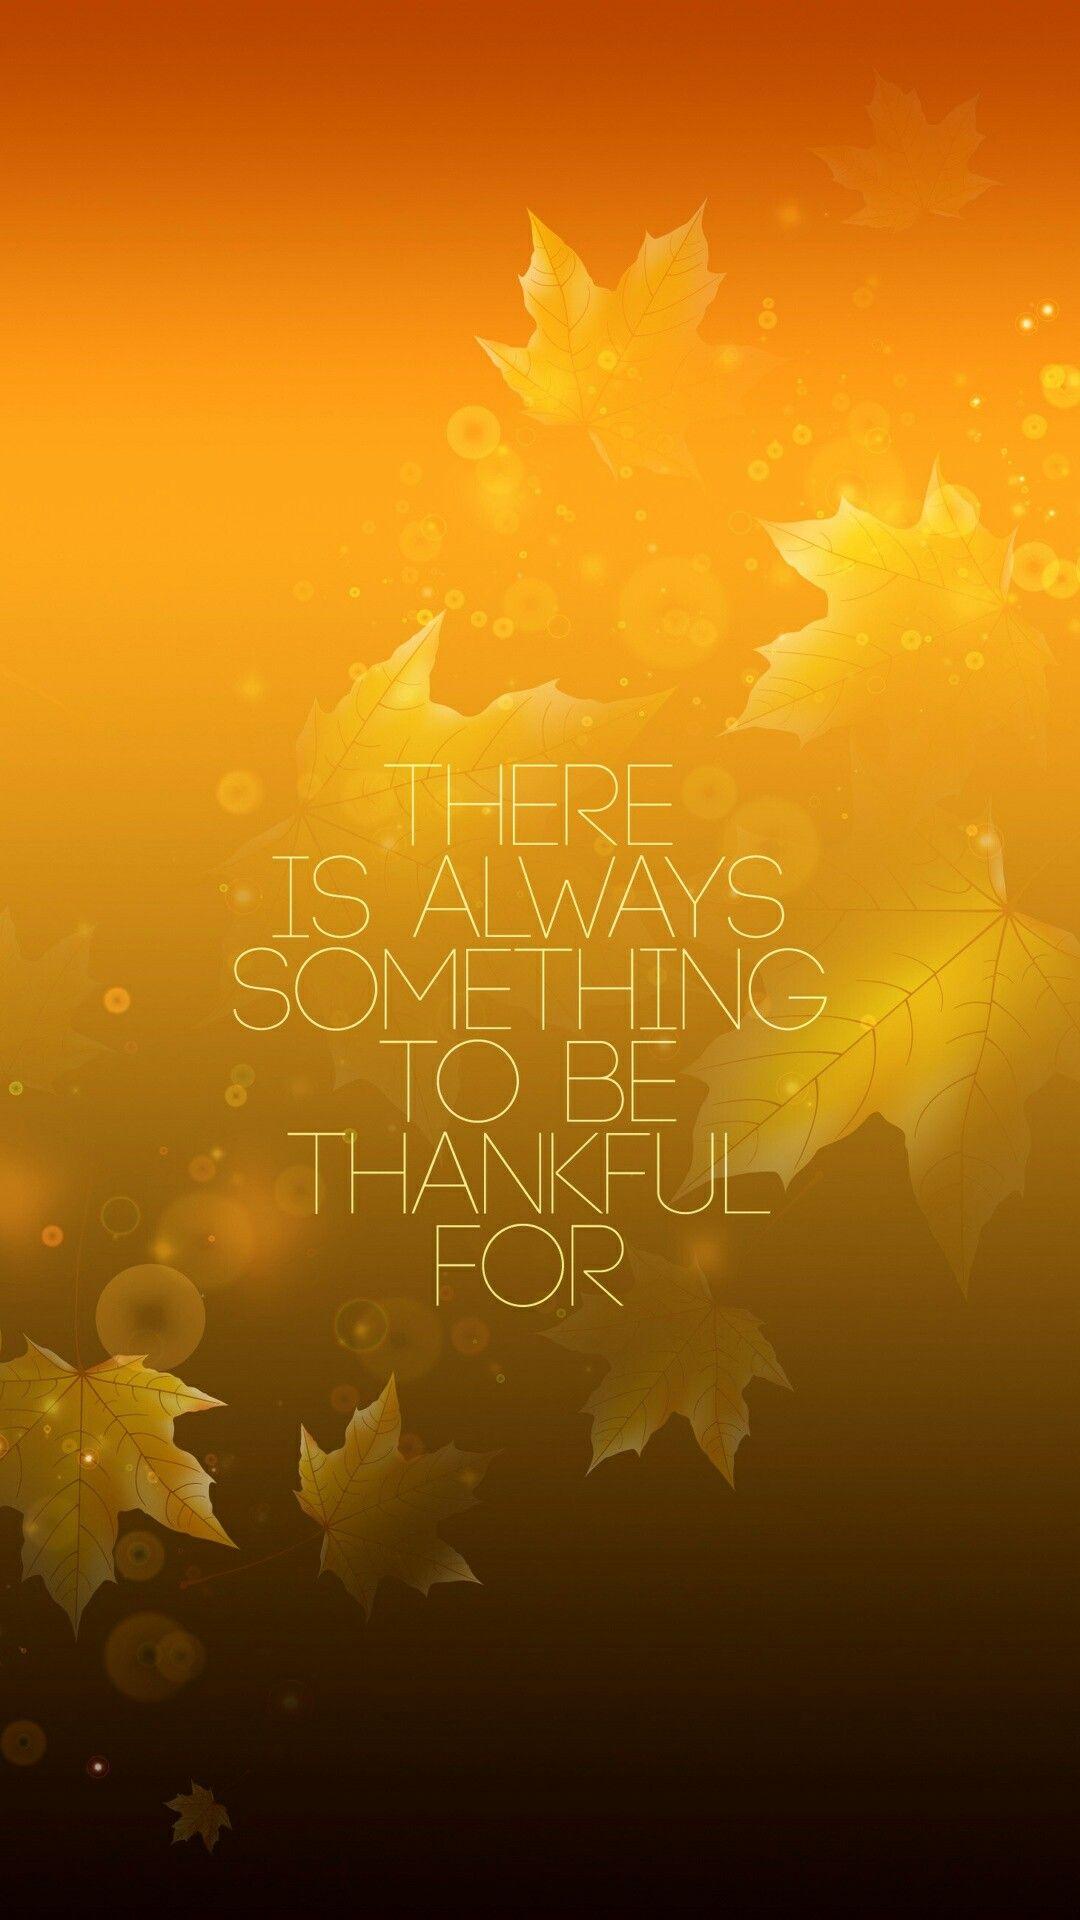 Thankful Thanksgiving wallpaper, Wallpaper backgrounds